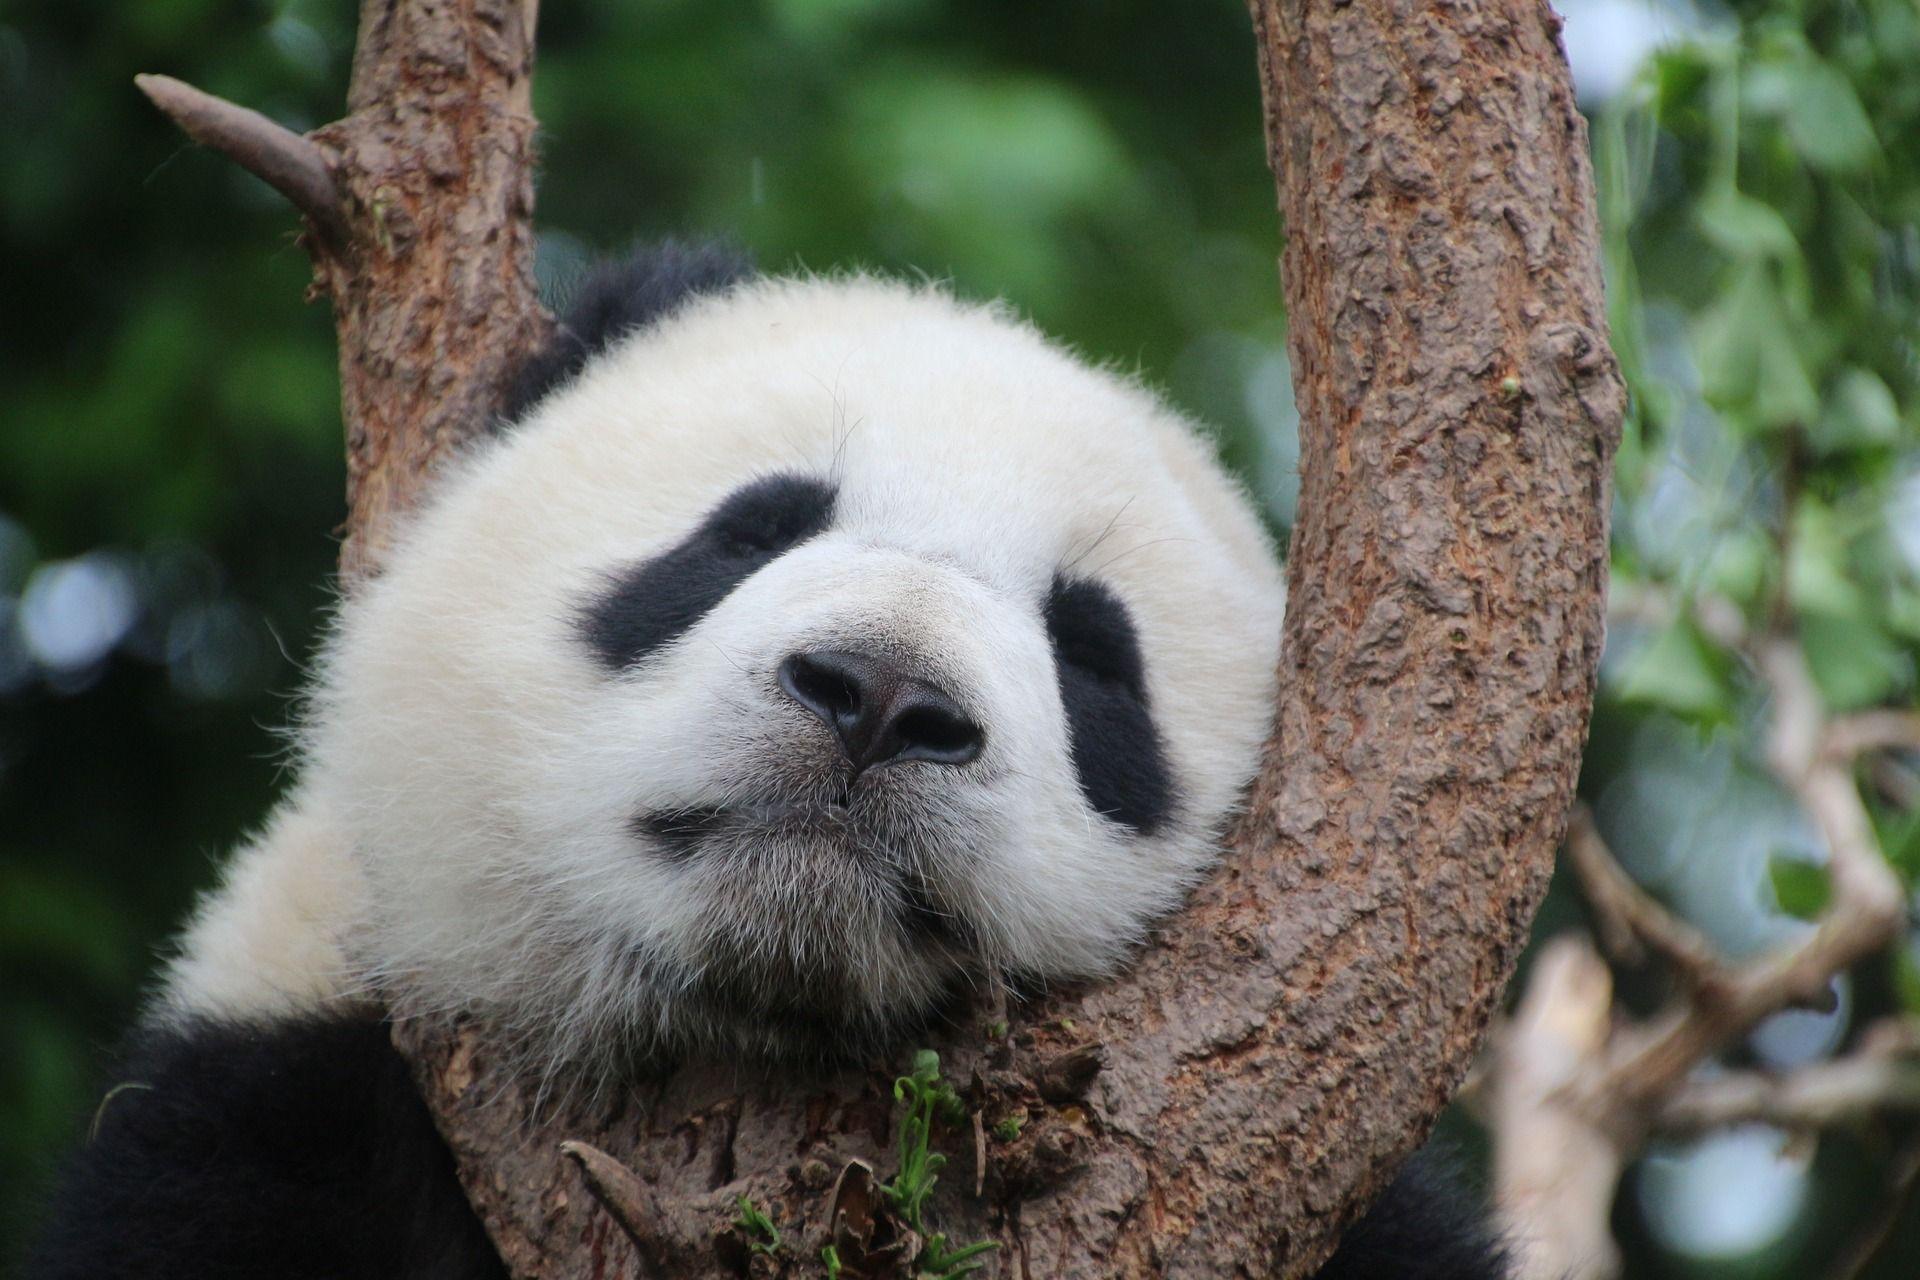 Московский зоопарк отказался от идеи нанять «обнимателя панд»